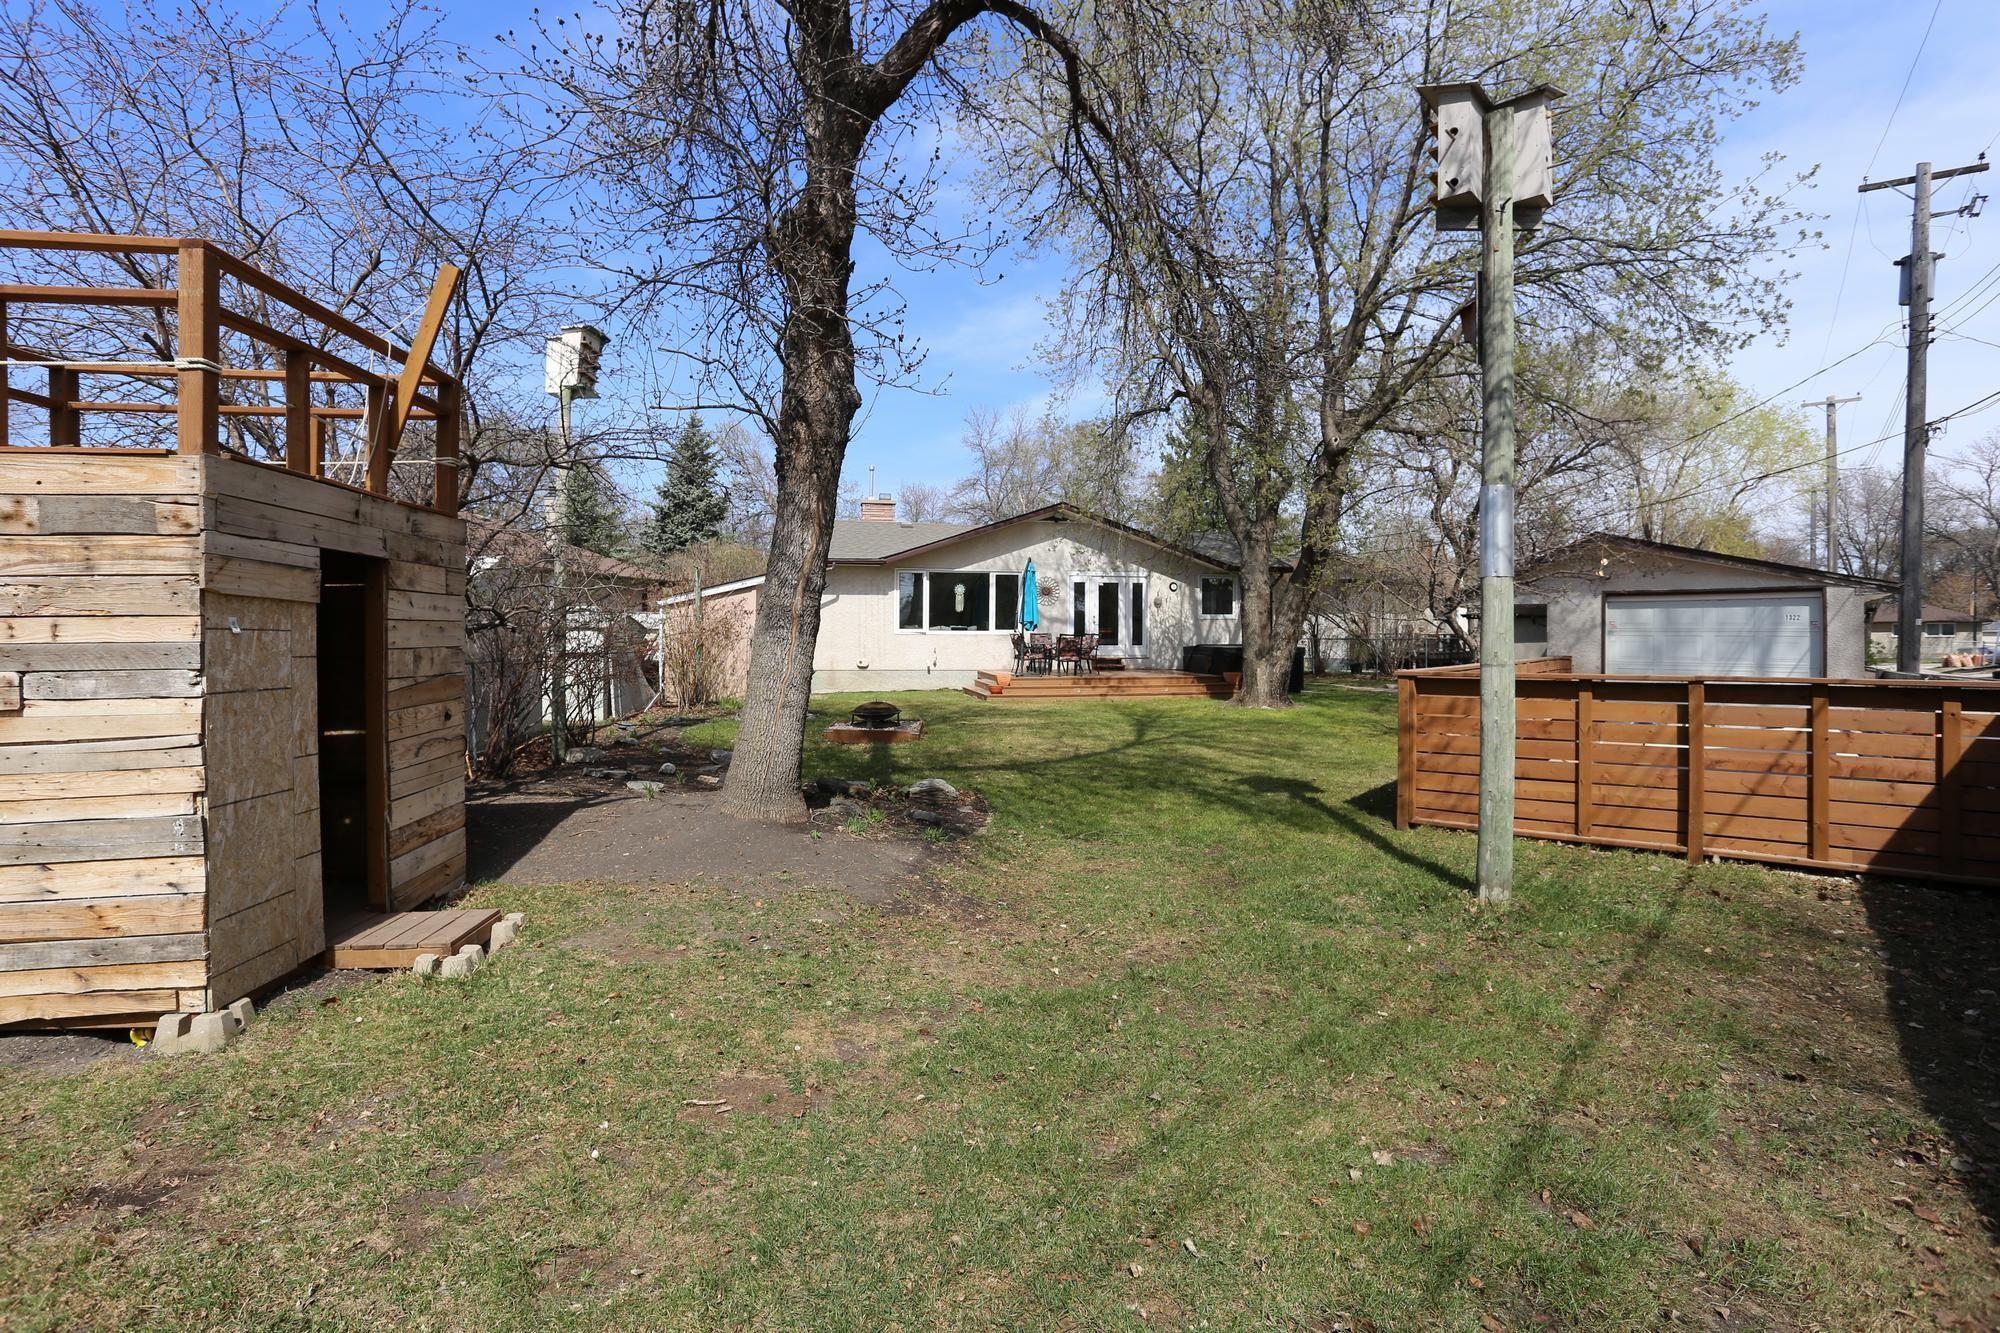 Photo 31: Photos: 1322 Valour Road in Winnipeg: Sargent Park Single Family Detached for sale (5C)  : MLS®# 1811835